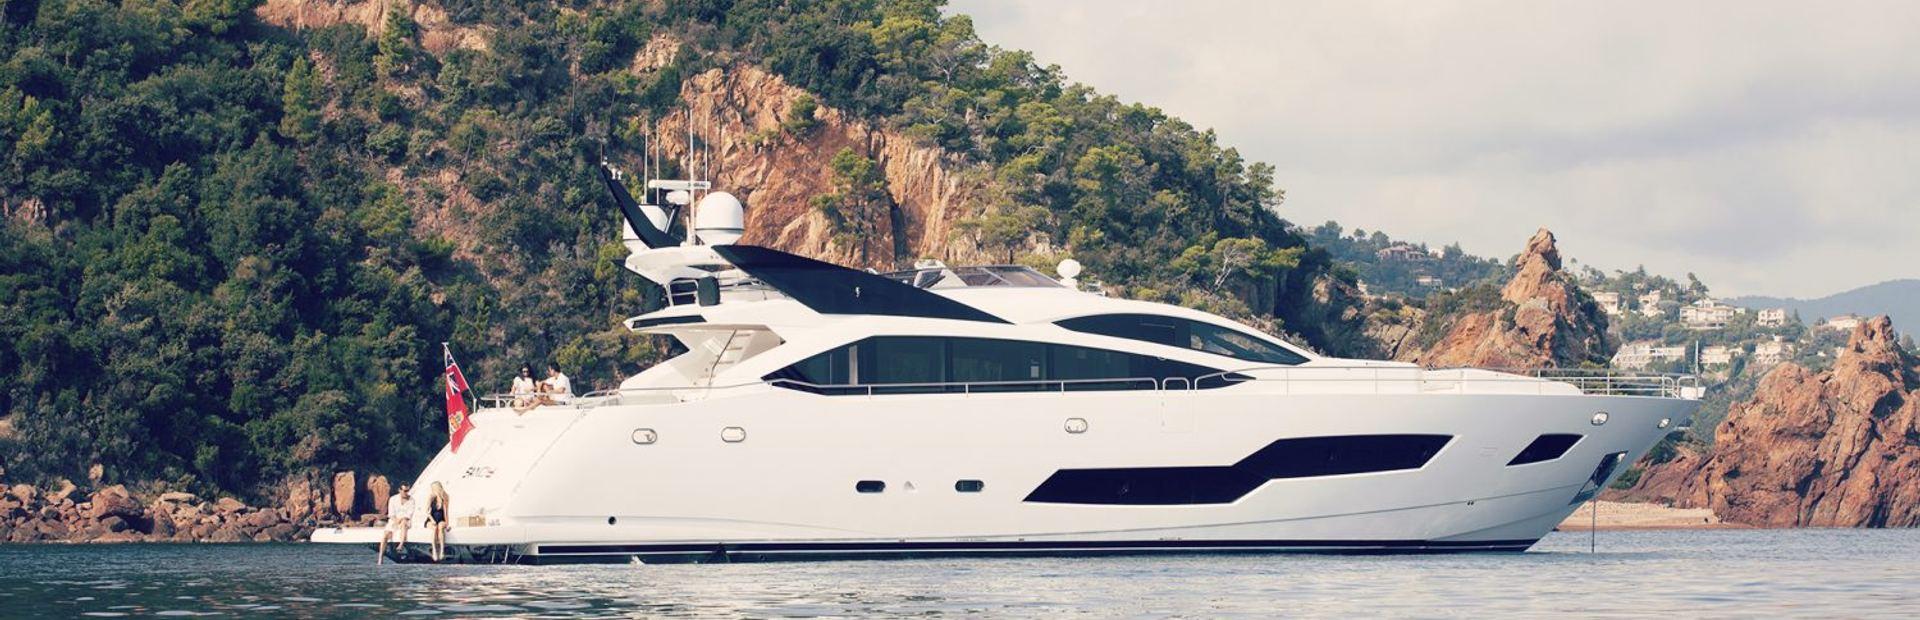 101 Sport Yacht Yacht Charter